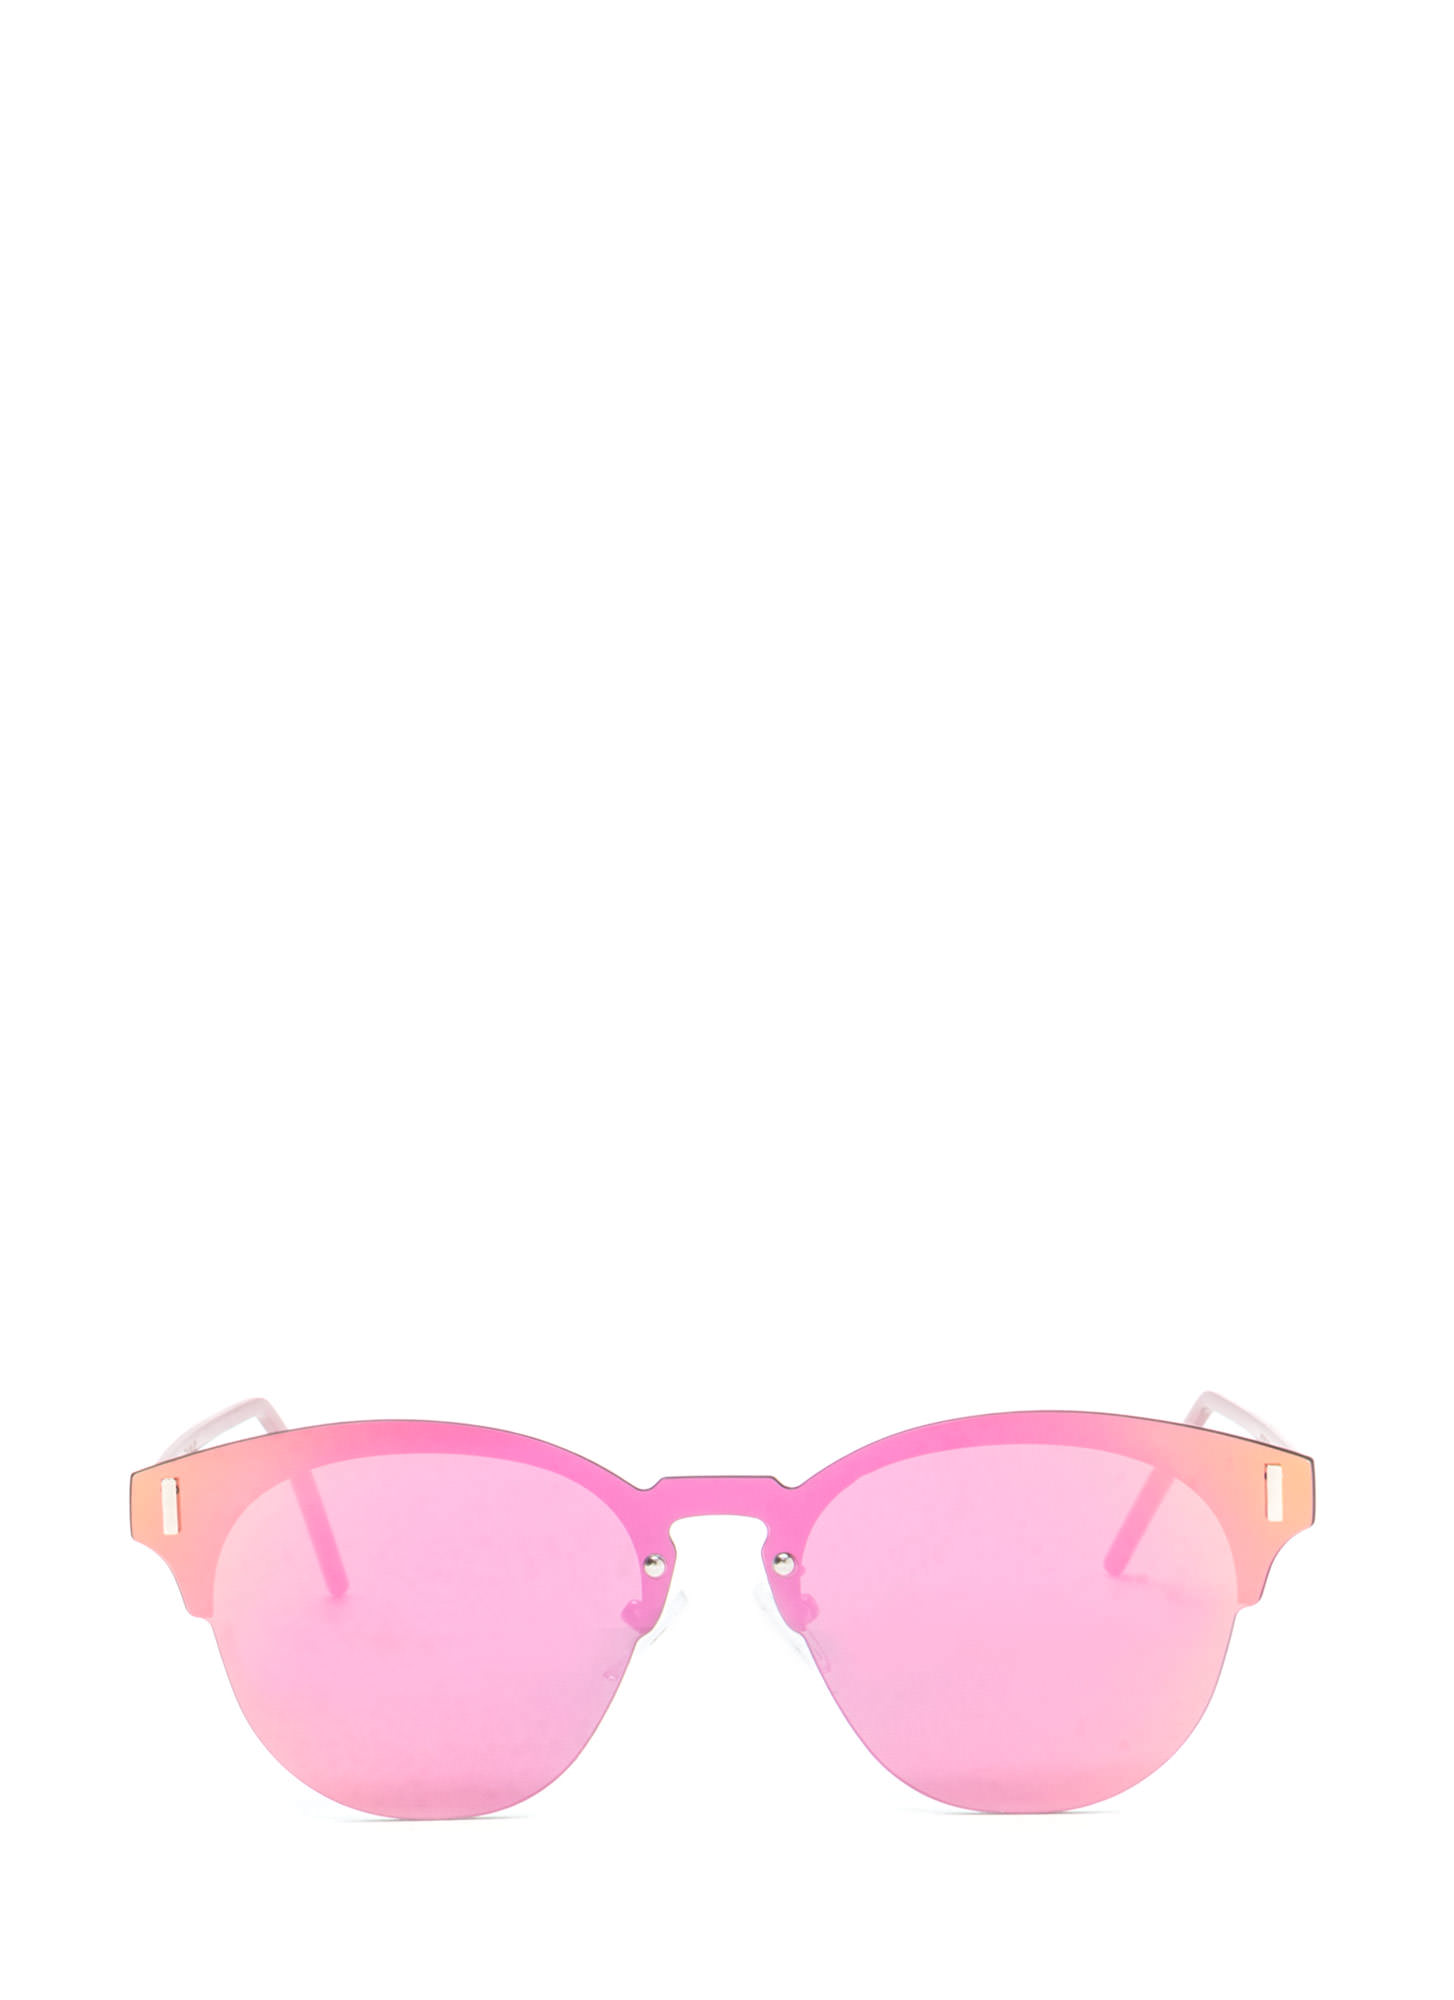 e46f2cc365 Fresh perspective mirrored sunglasses blue olive orange pink silver jpg  1454x2000 Olive mirrored aviators